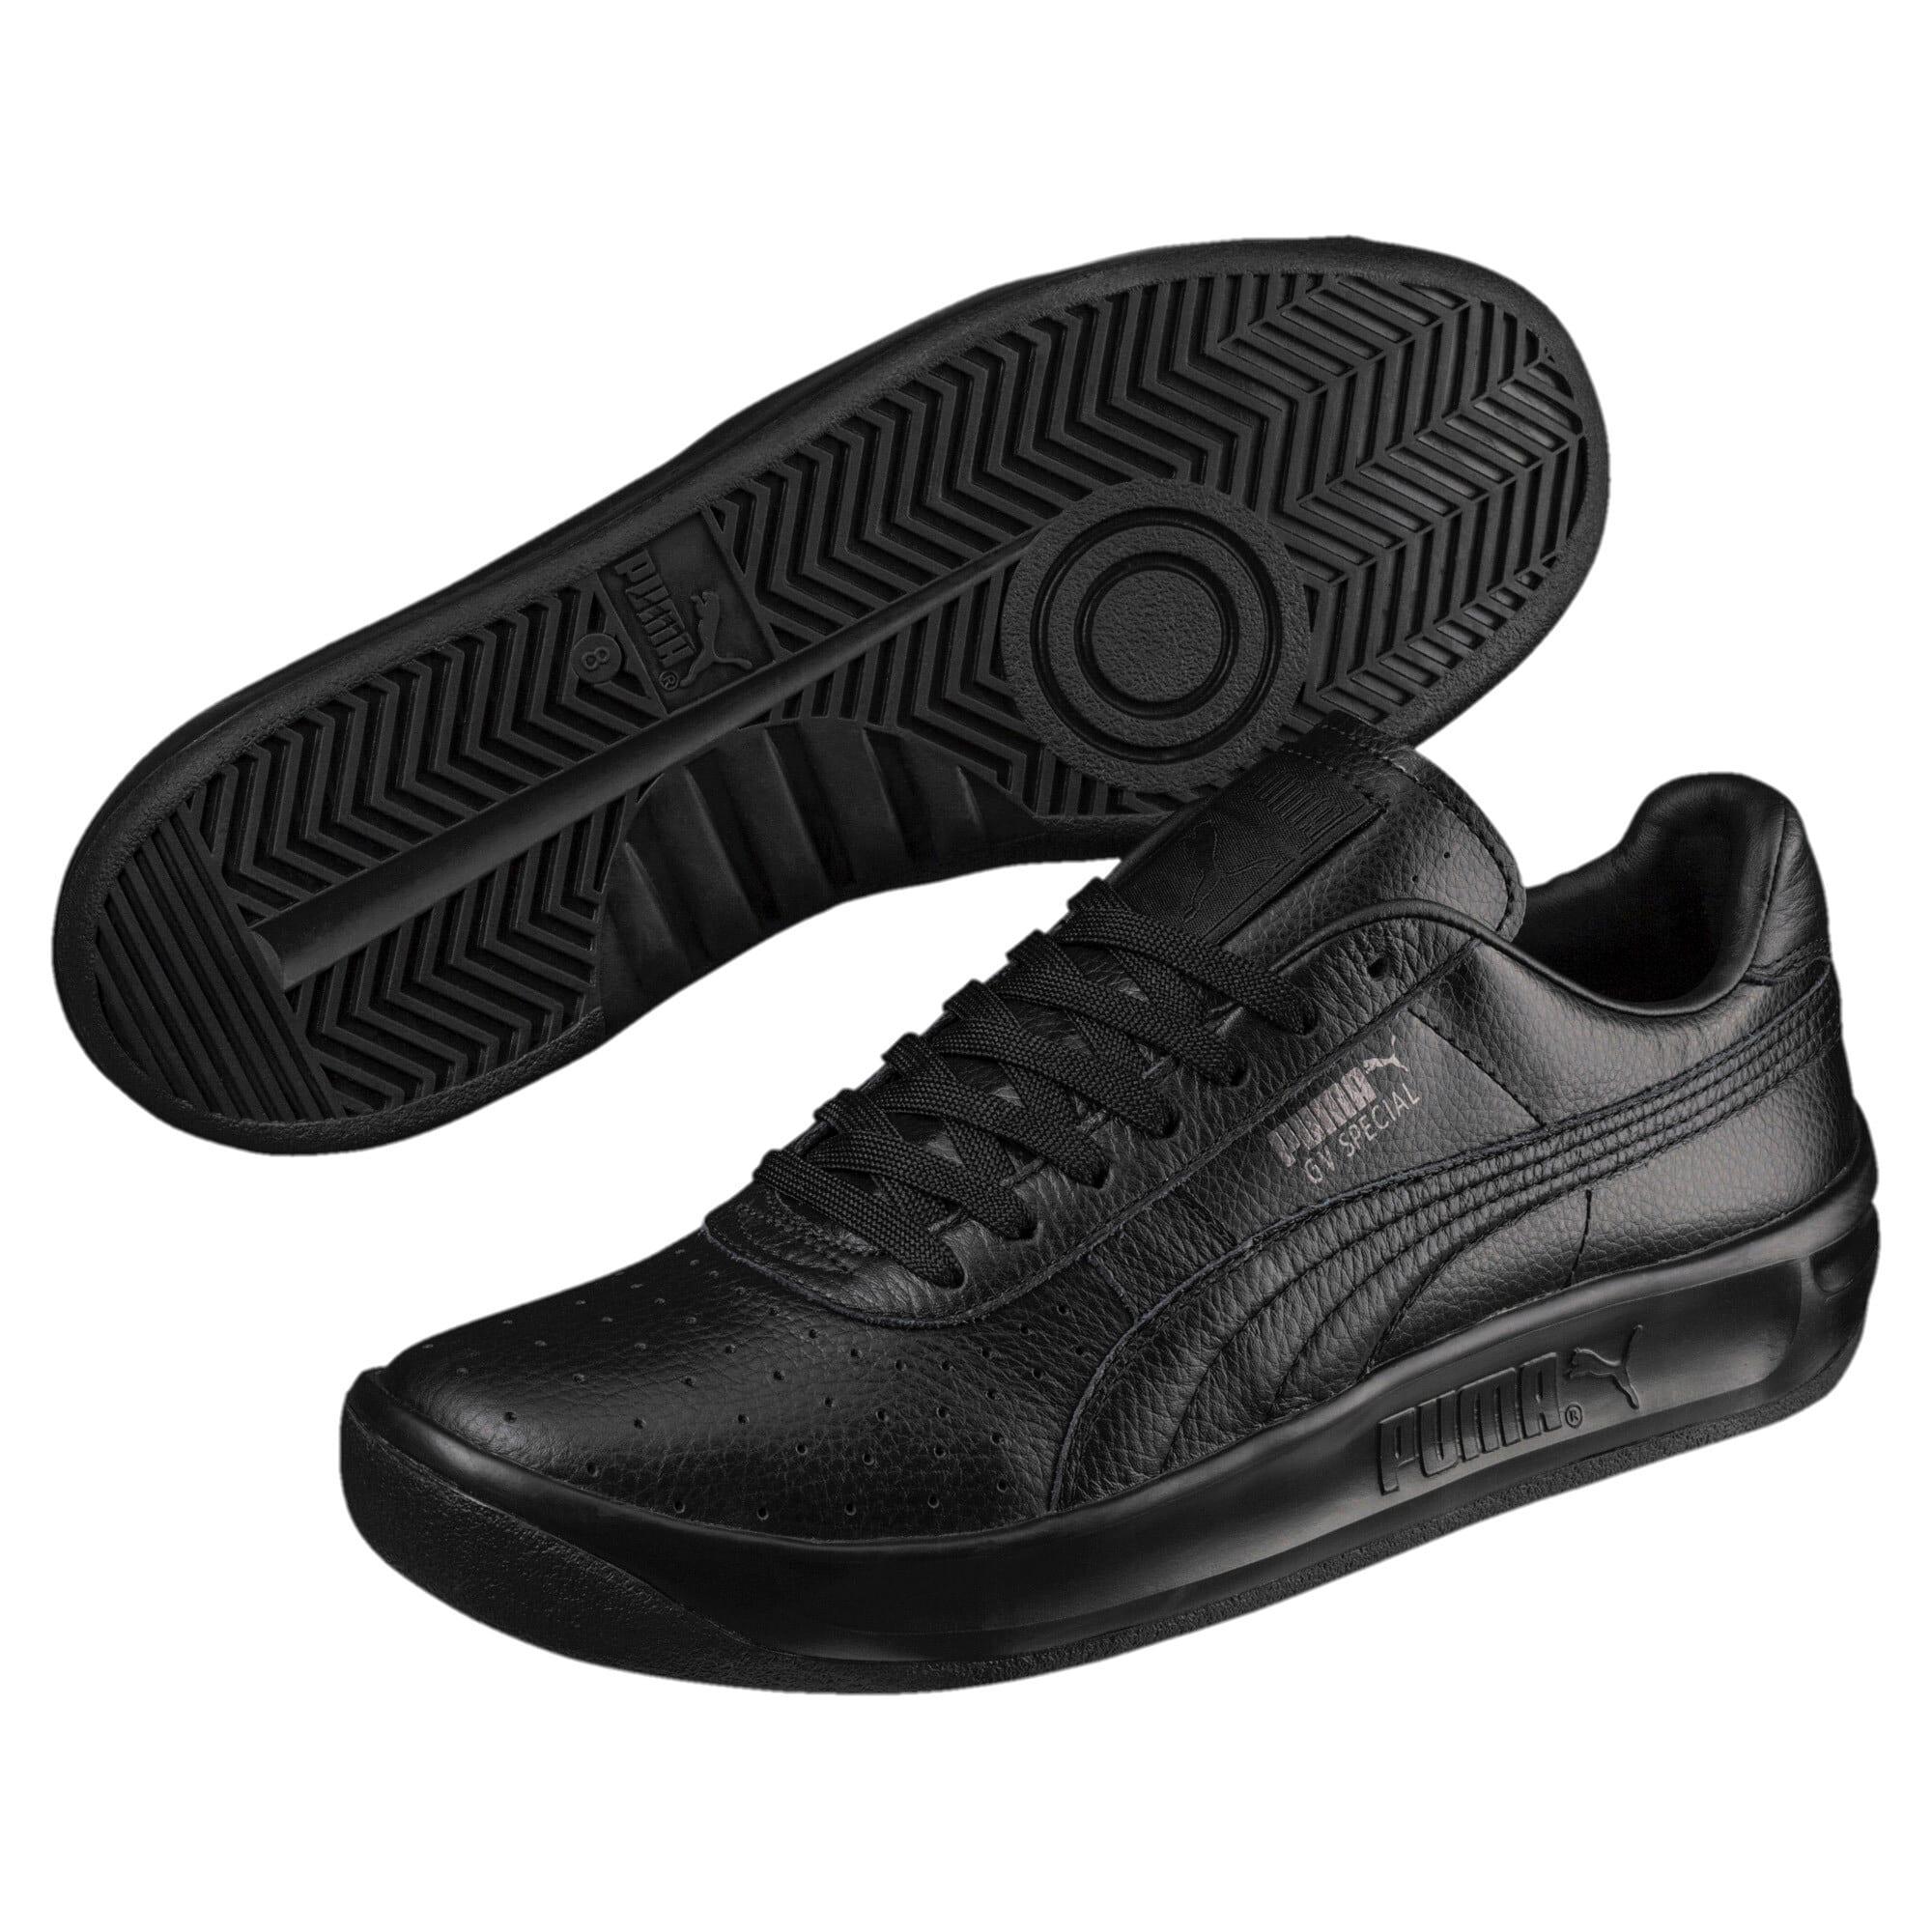 Thumbnail 2 of GV Special+ Sneakers, Puma Black-Puma Black, medium